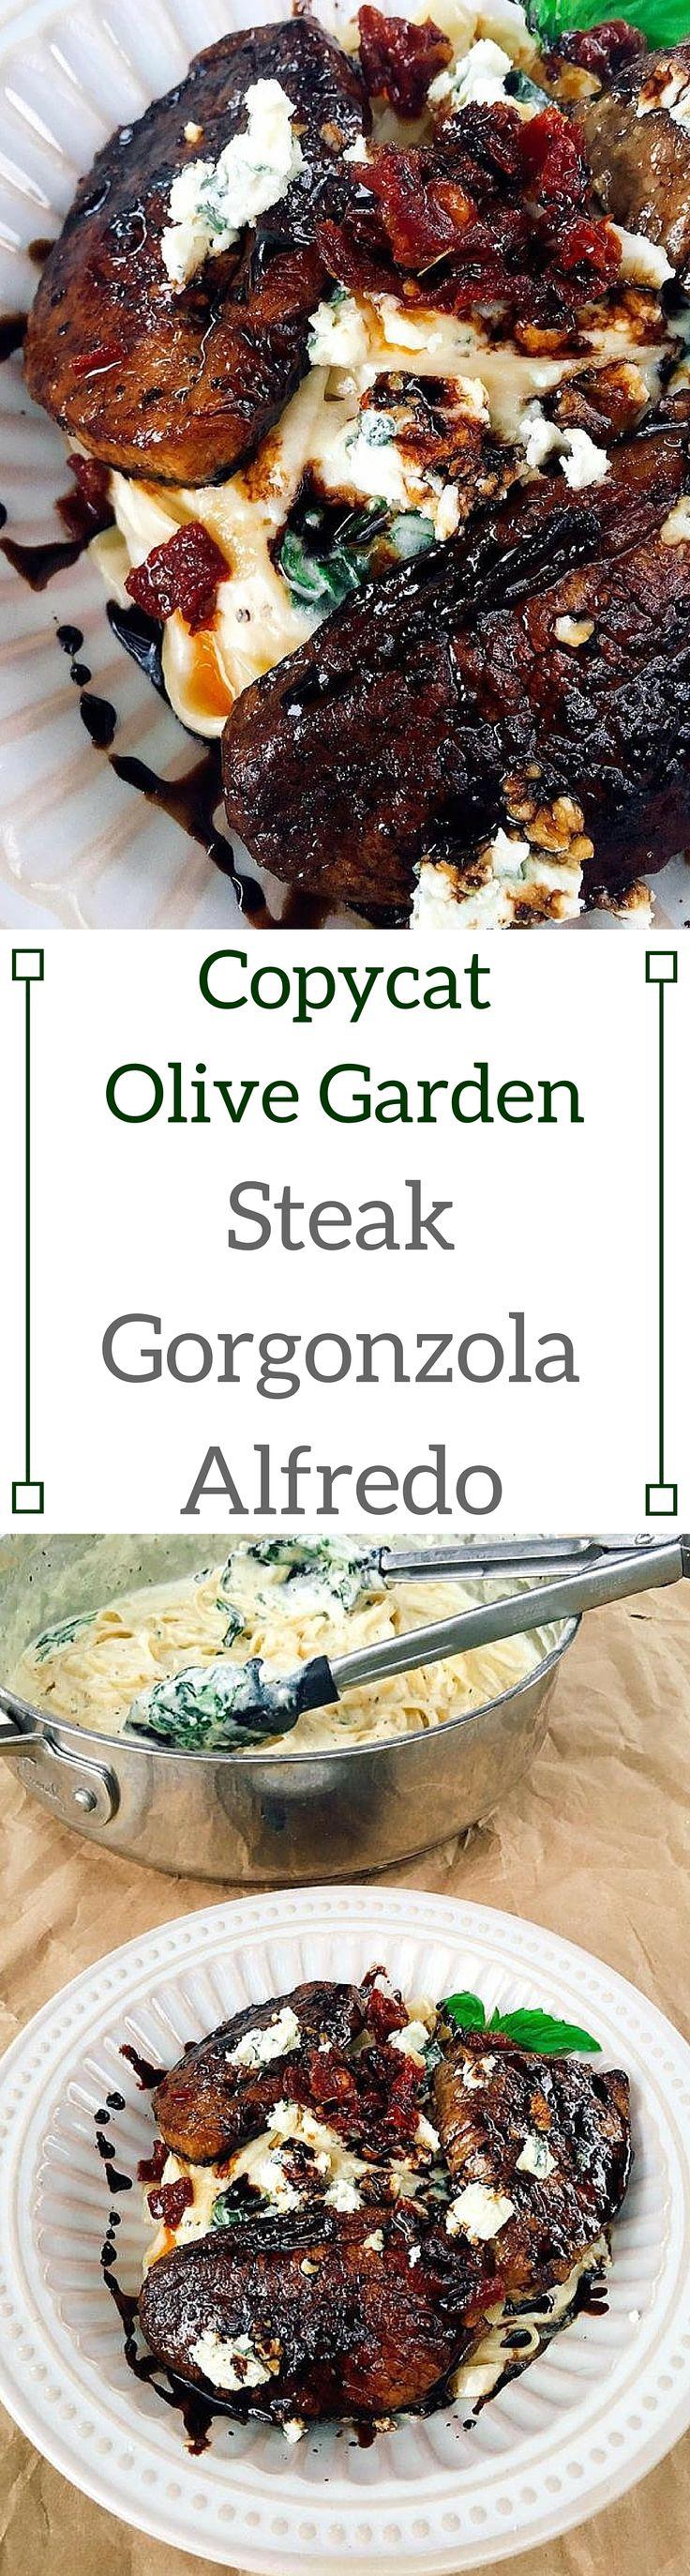 Copycat Olive Garden Steak Gorgonzola Alfredo | Three Olives Branch https://uk.pinterest.com/uksportoutdoors/bags-and-packs/